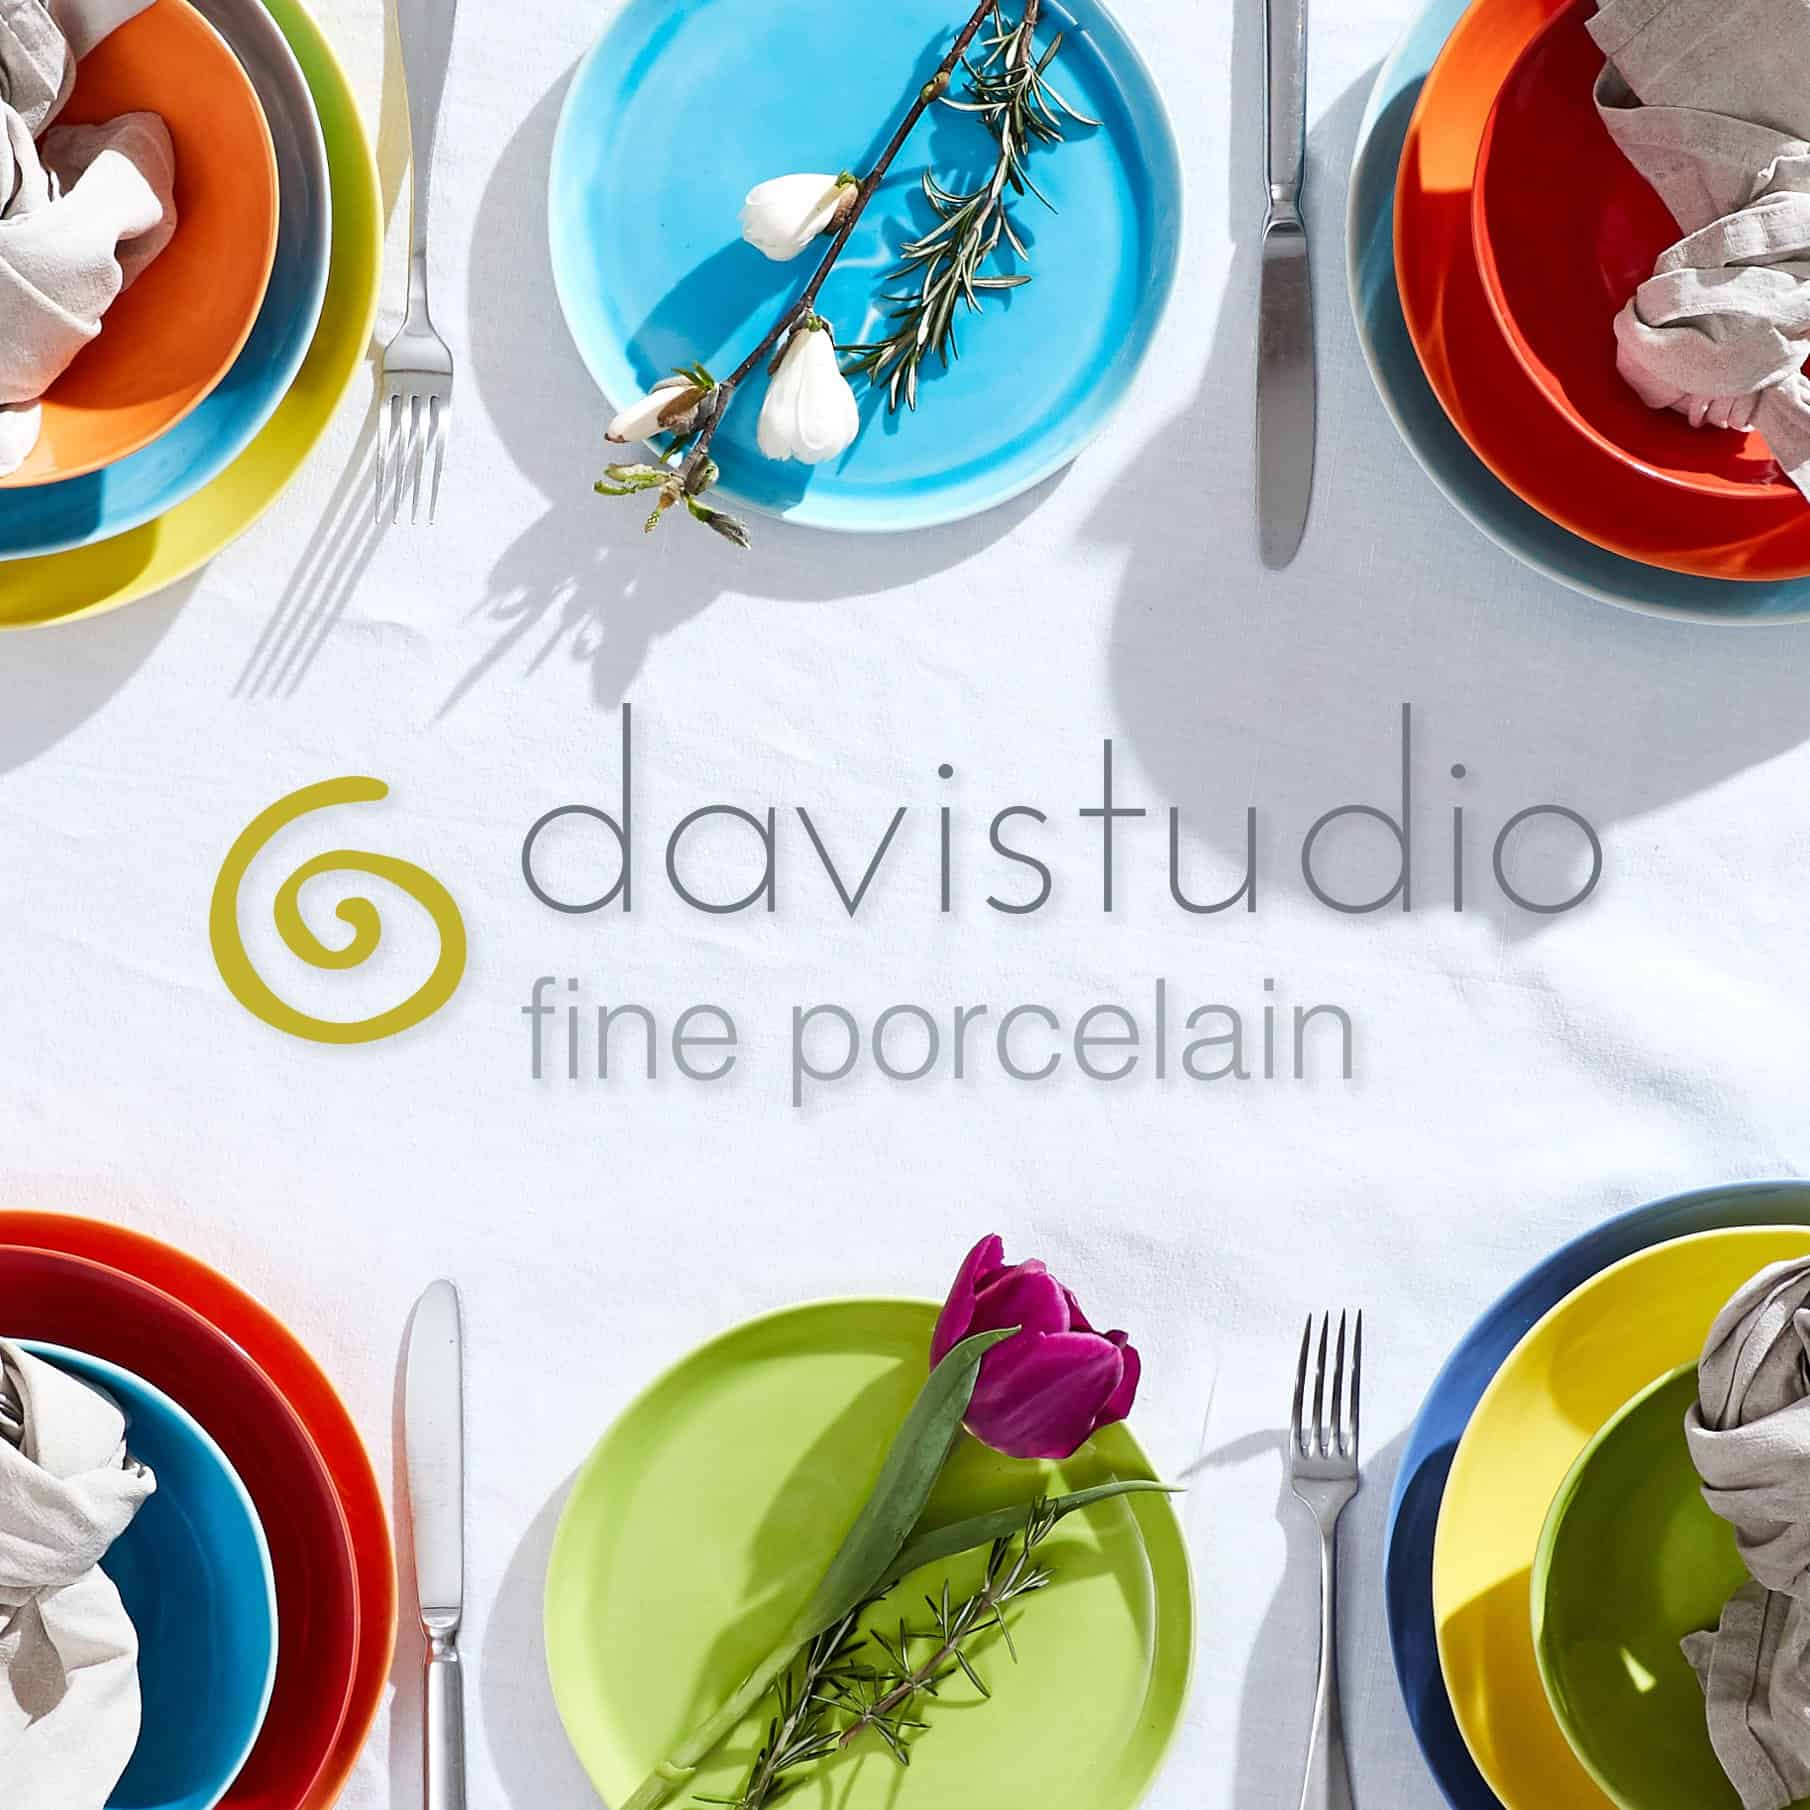 Davis Studios